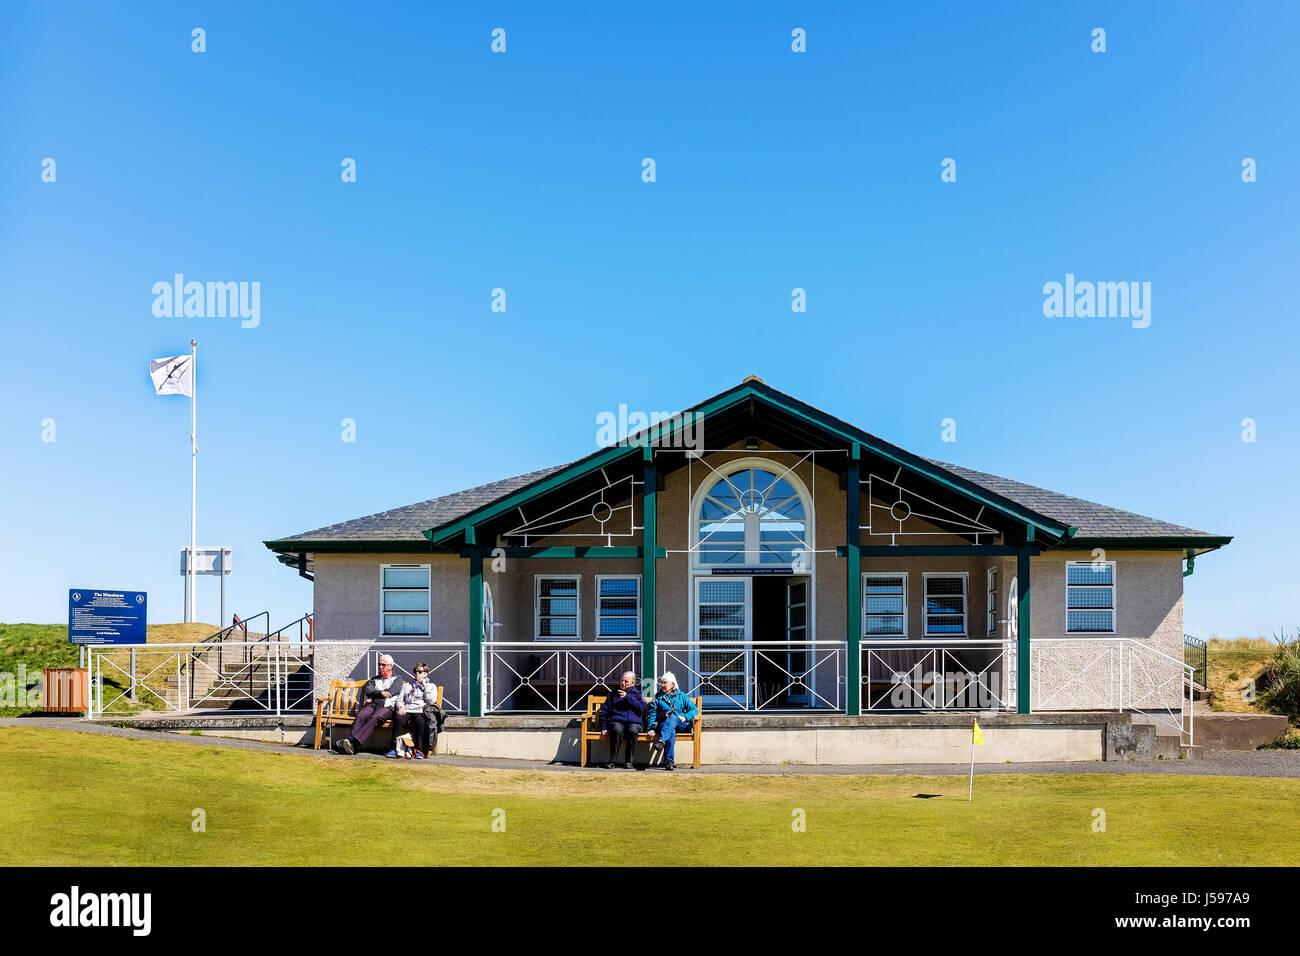 Clubhouse per St Andrews Ladies Putting Club, l'Himalaya Corso, St Andrews Fife, Scozia, Regno Unito Foto Stock